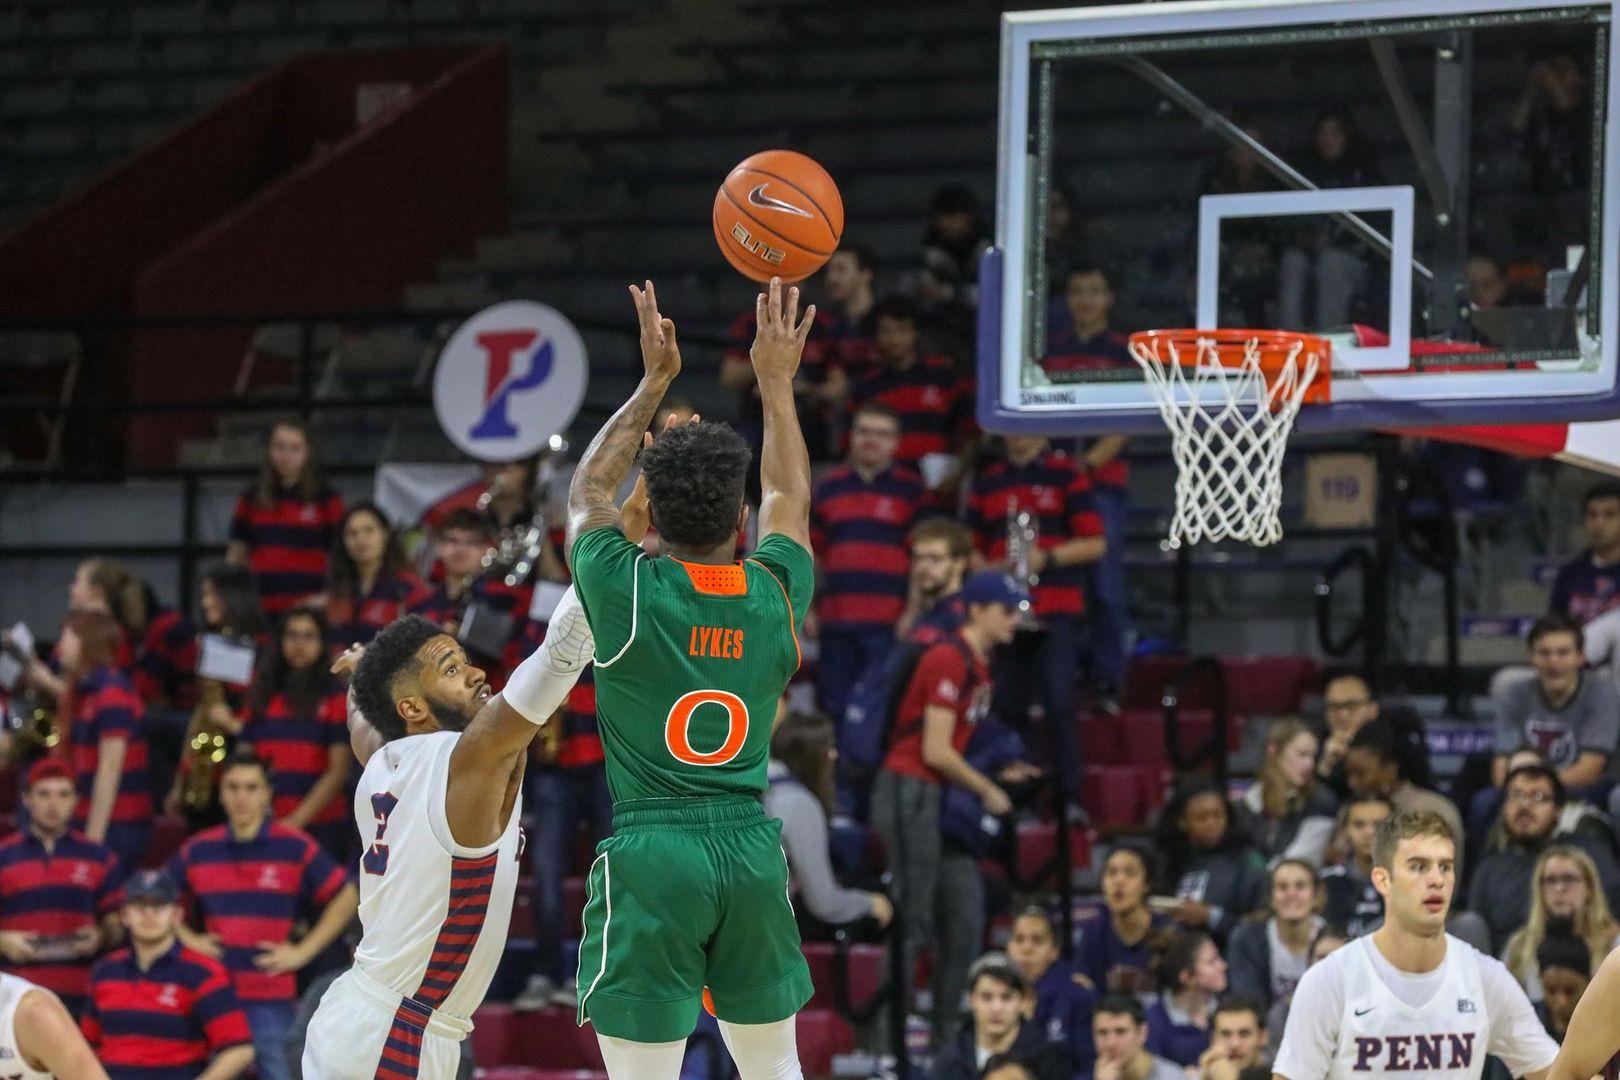 Miami's Late Comeback Falls Short at Penn